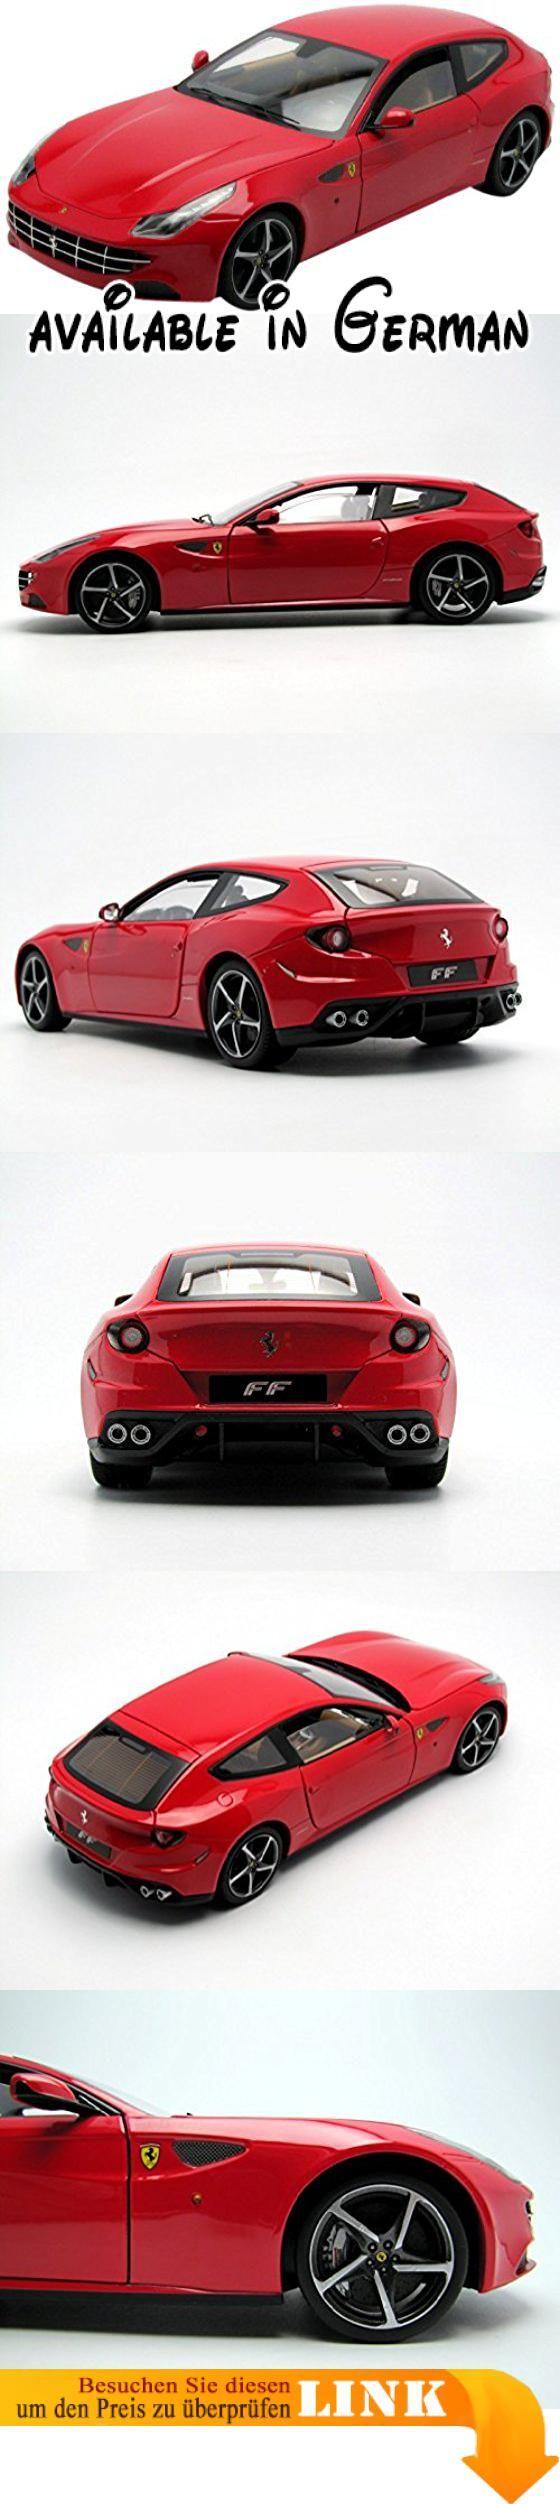 Mattel-Elite Ferrari FF 1:18. 1/18 scale #Toy #TOYS_AND_GAMES